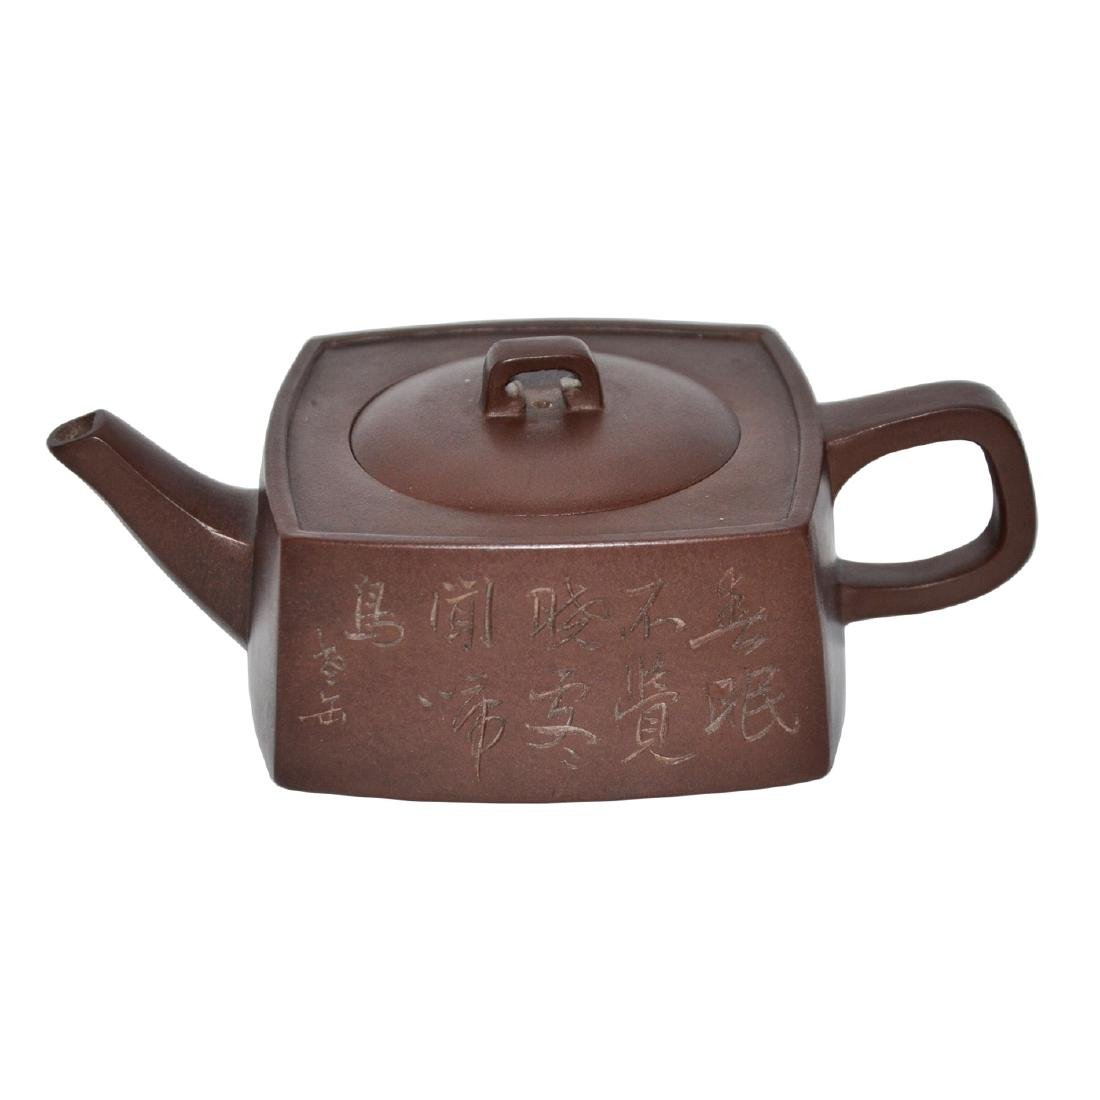 Square Zisha Teapot with Poem Inscription